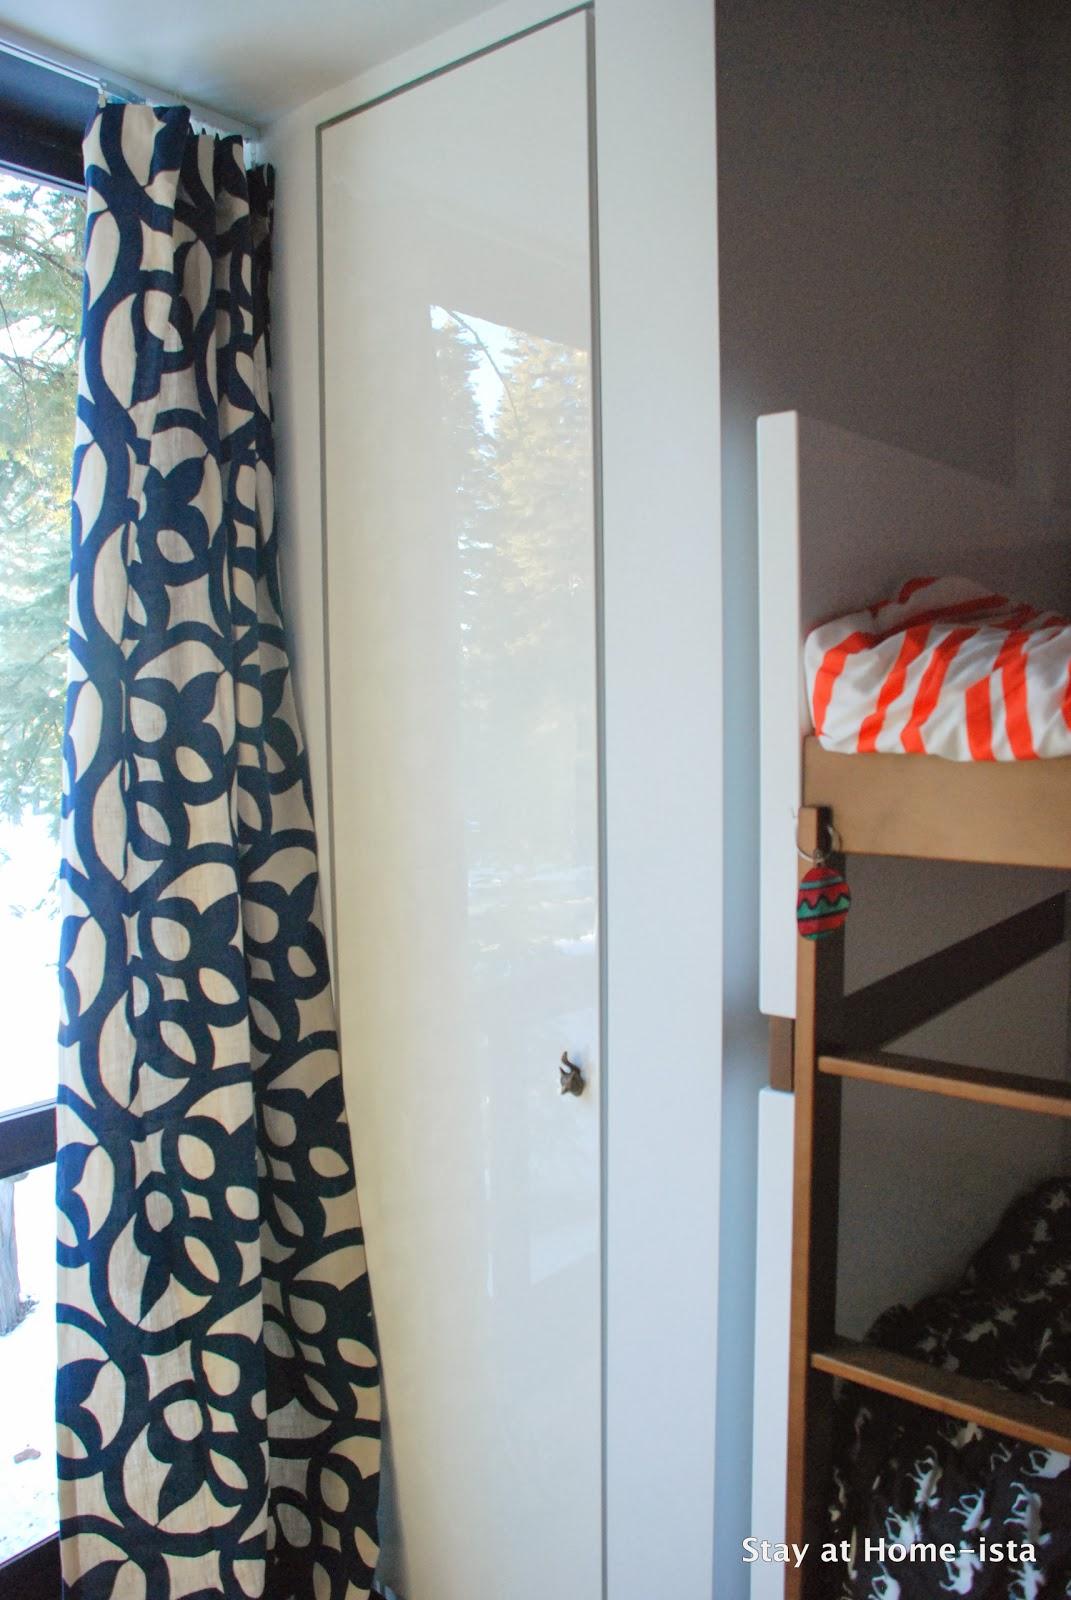 Ikea Pax closet system built ins